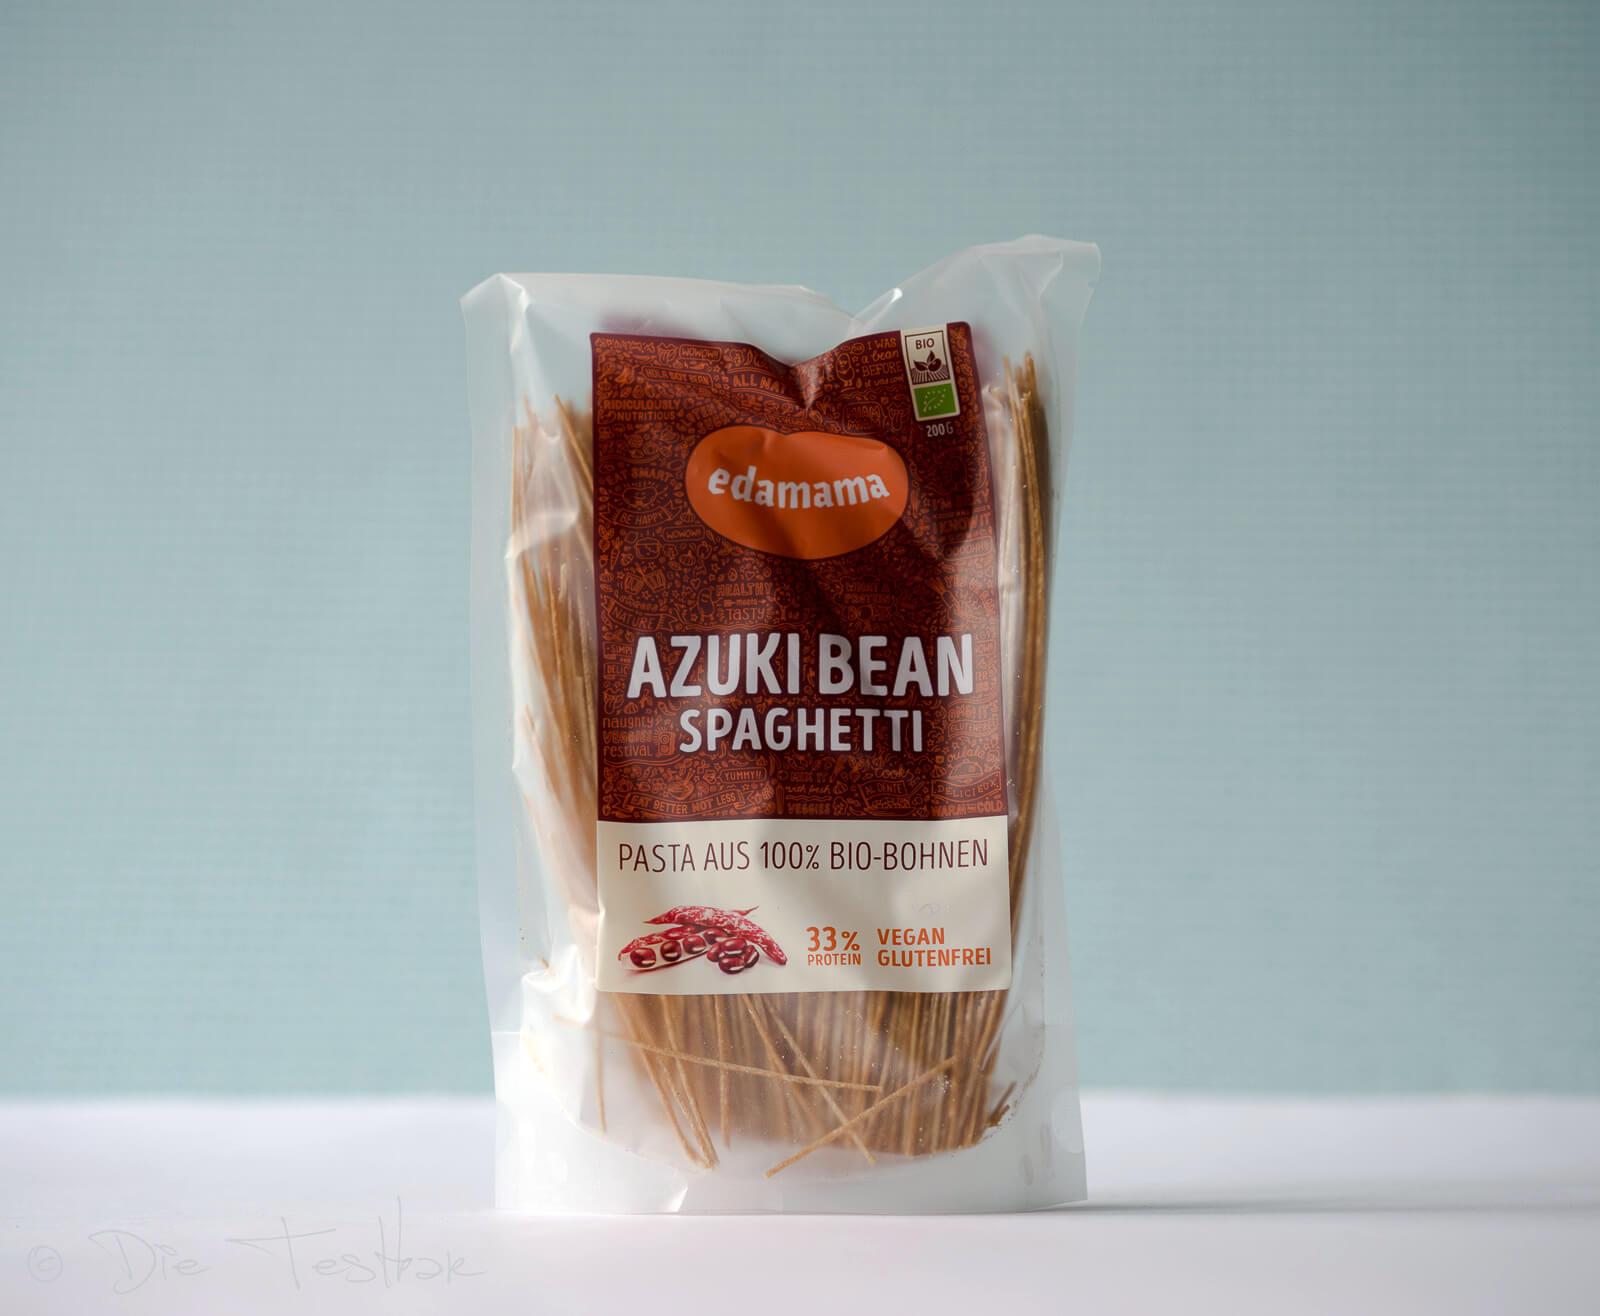 Edamama - Edamama Azuki Bean Spaghetti